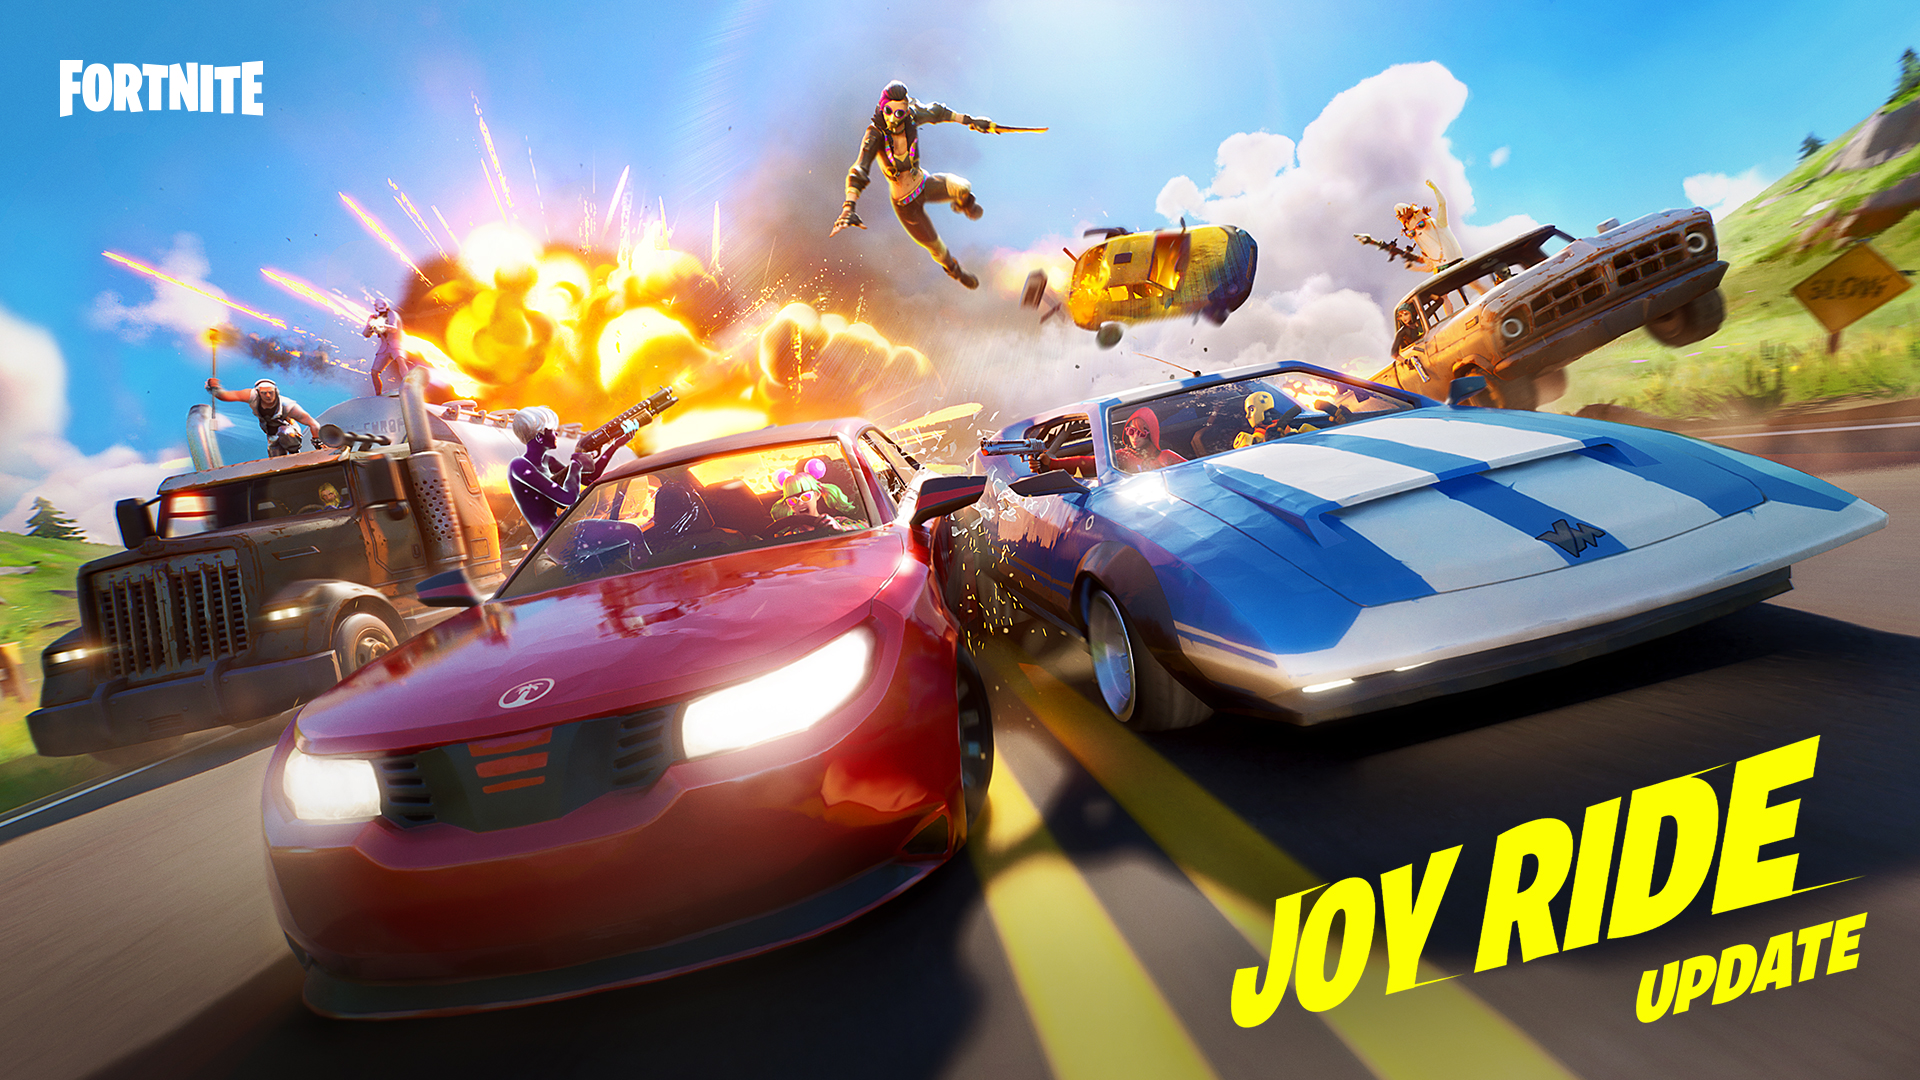 Fortnite Joy Ride